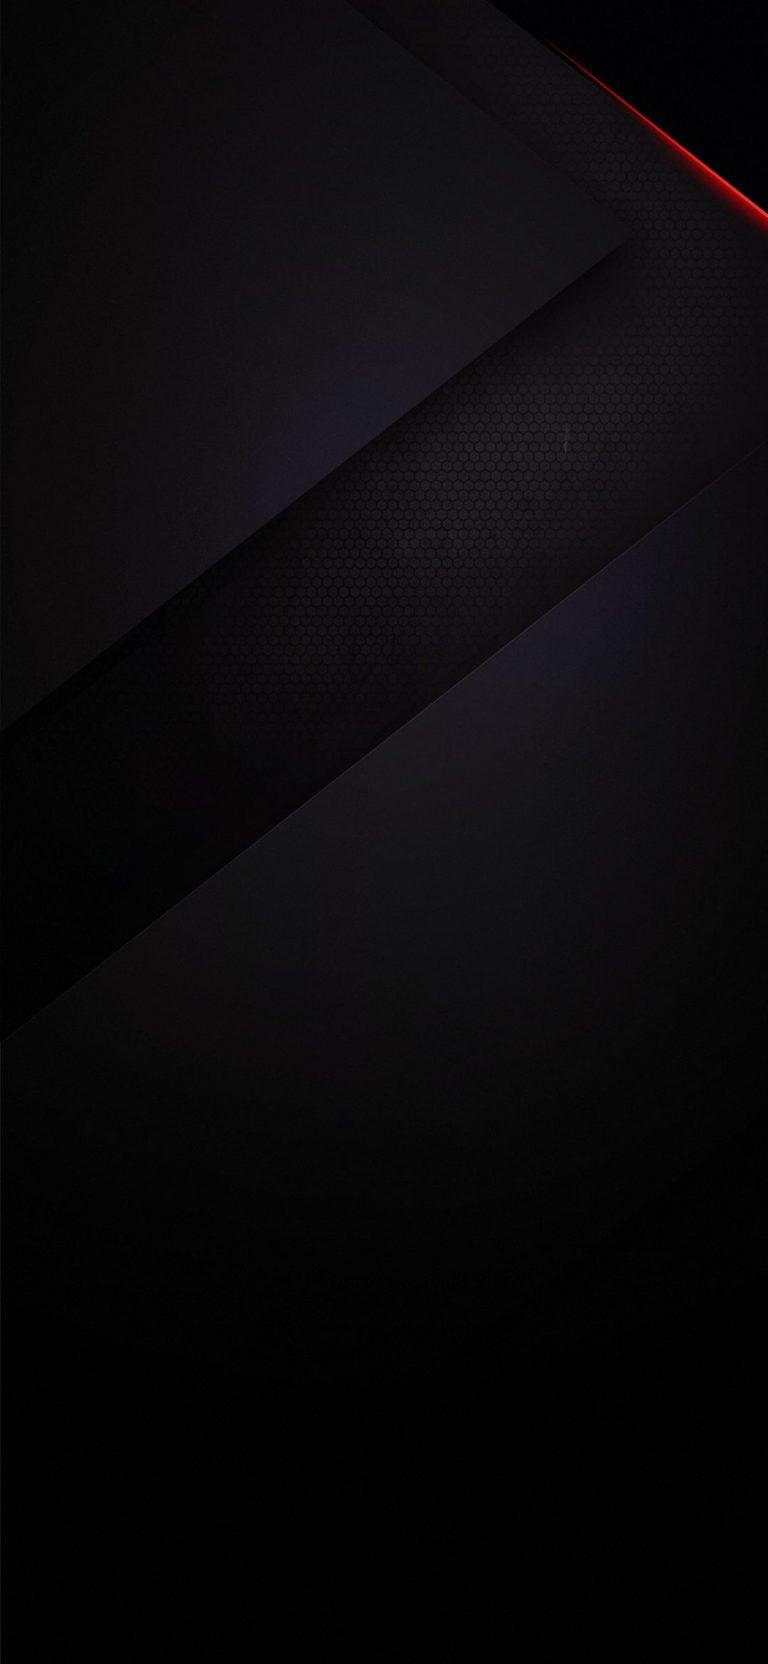 ZTE Nubia Red Magic 3 Stock Wallpaper 02 1080x2340 768x1664